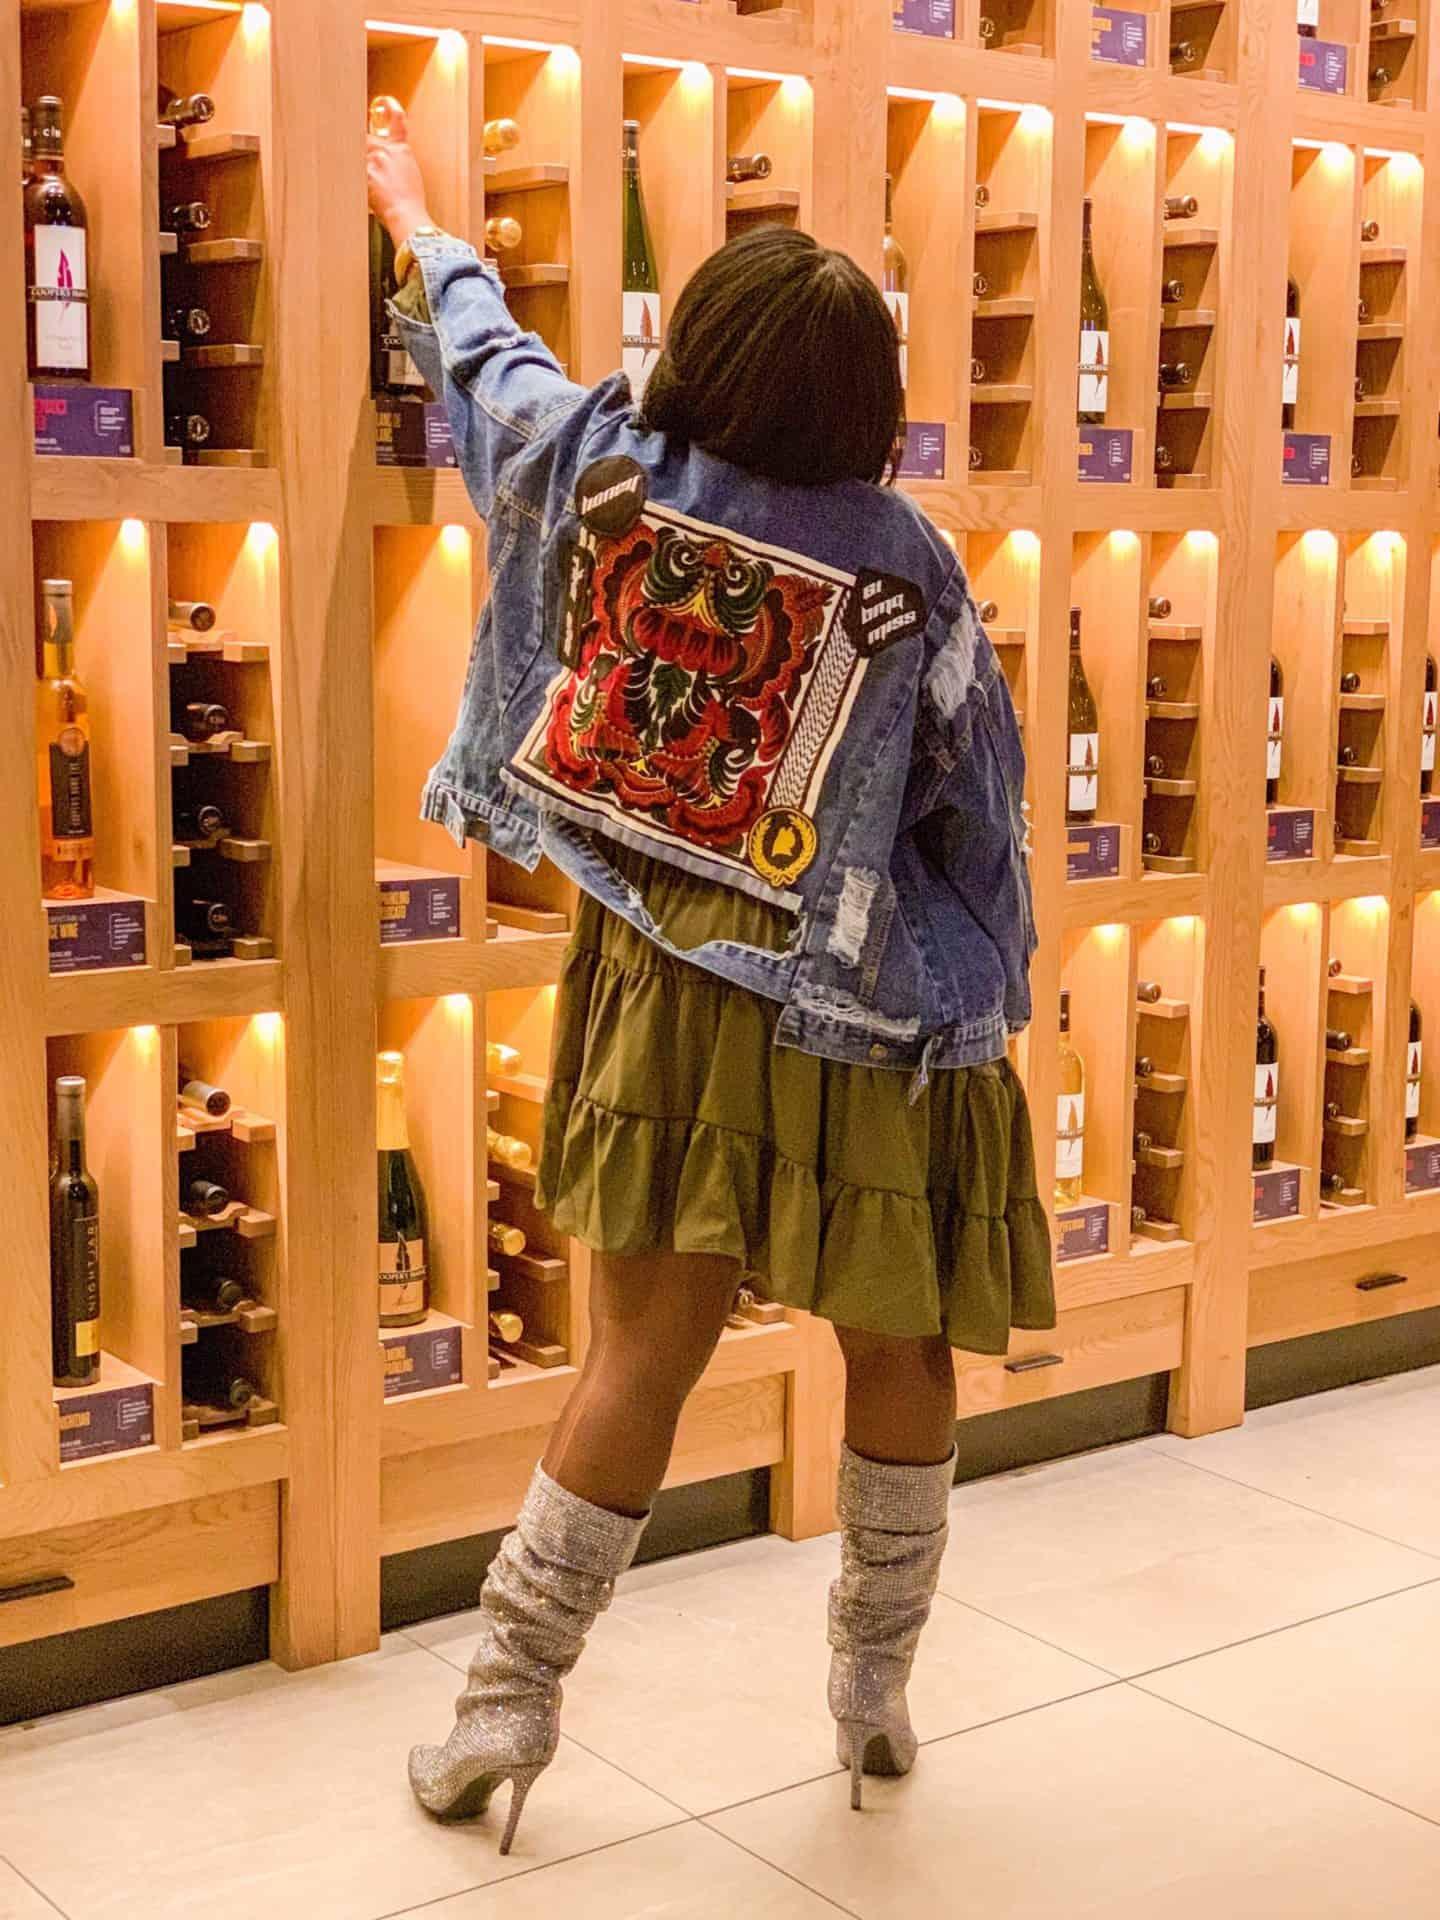 Shaunda Necole x Jessica Simpson Bling Boots & Ripped Jean Jacket